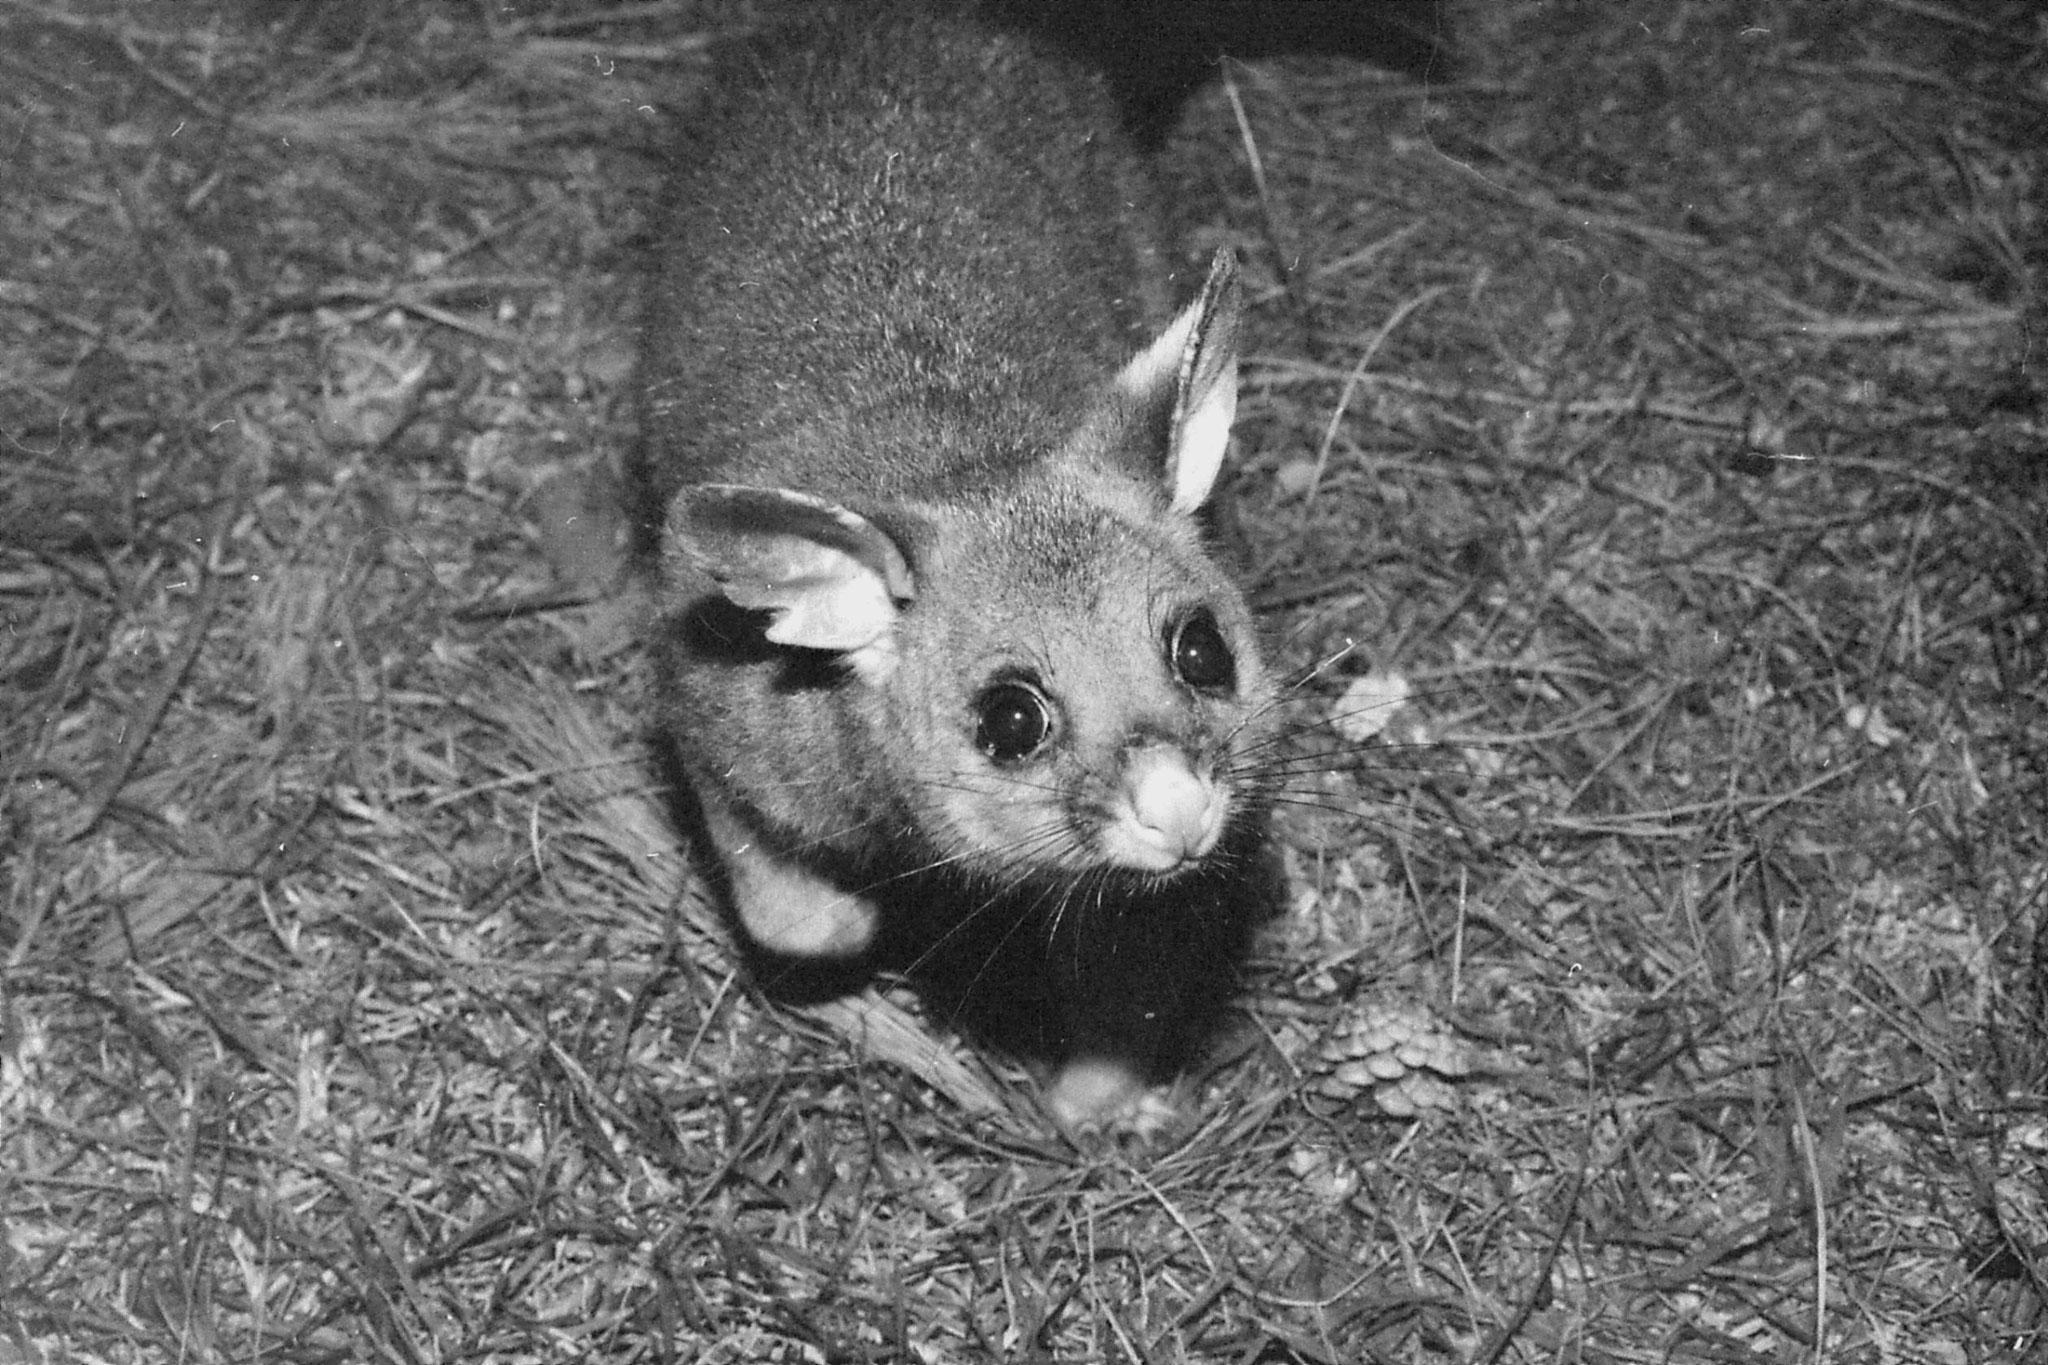 22/9/1990: 4: Dimboola Caravan Park possums